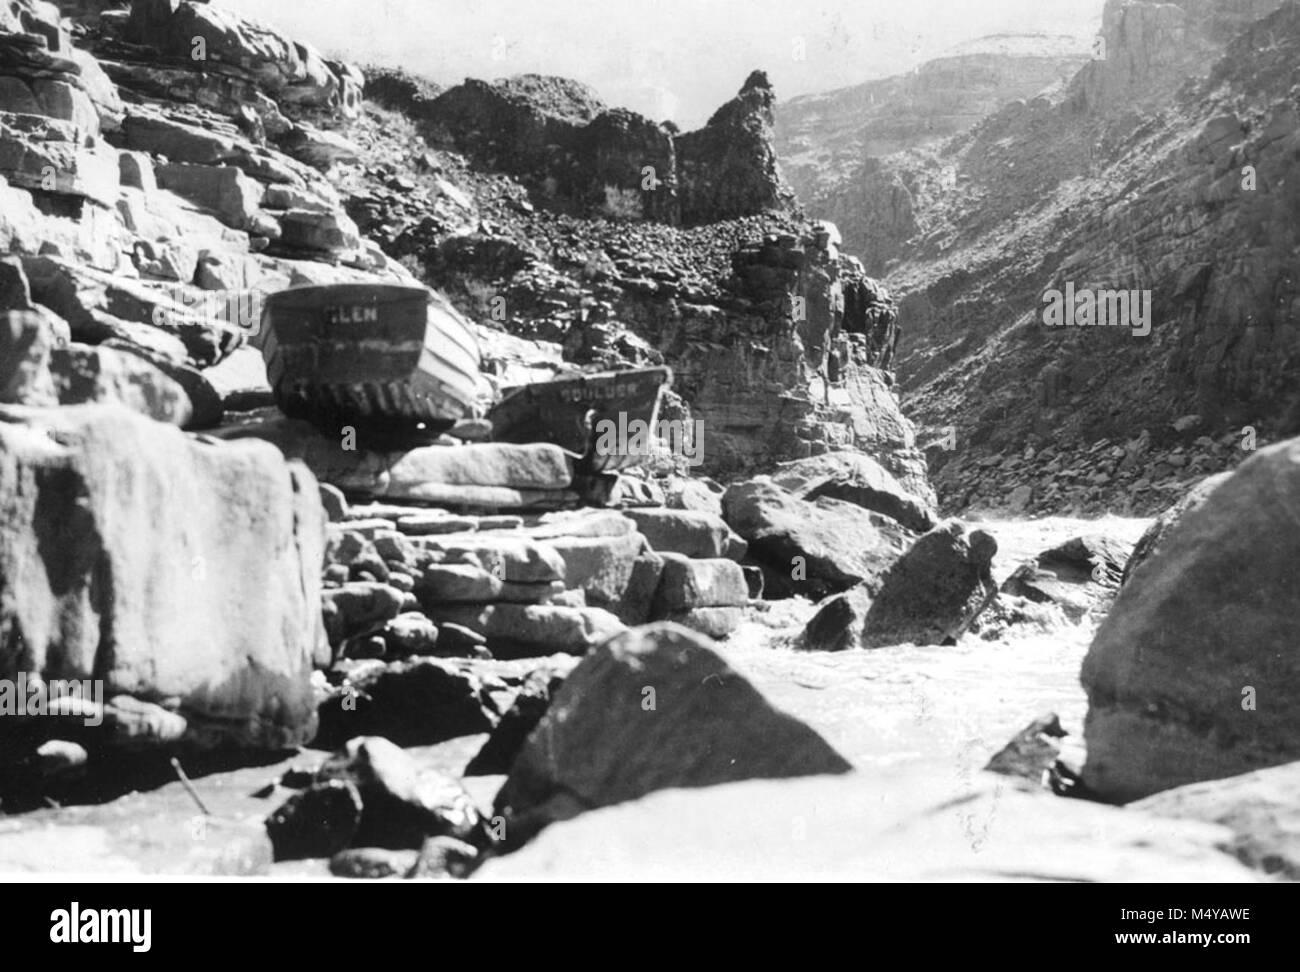 U.S.G.S. TRIP: BOATS GLEN & BOULDER HAVING BEEN LINED PAST LAVA ESCARPMENT RAPID. 12 OCT 1923. USGS, LARUE. - Stock Image